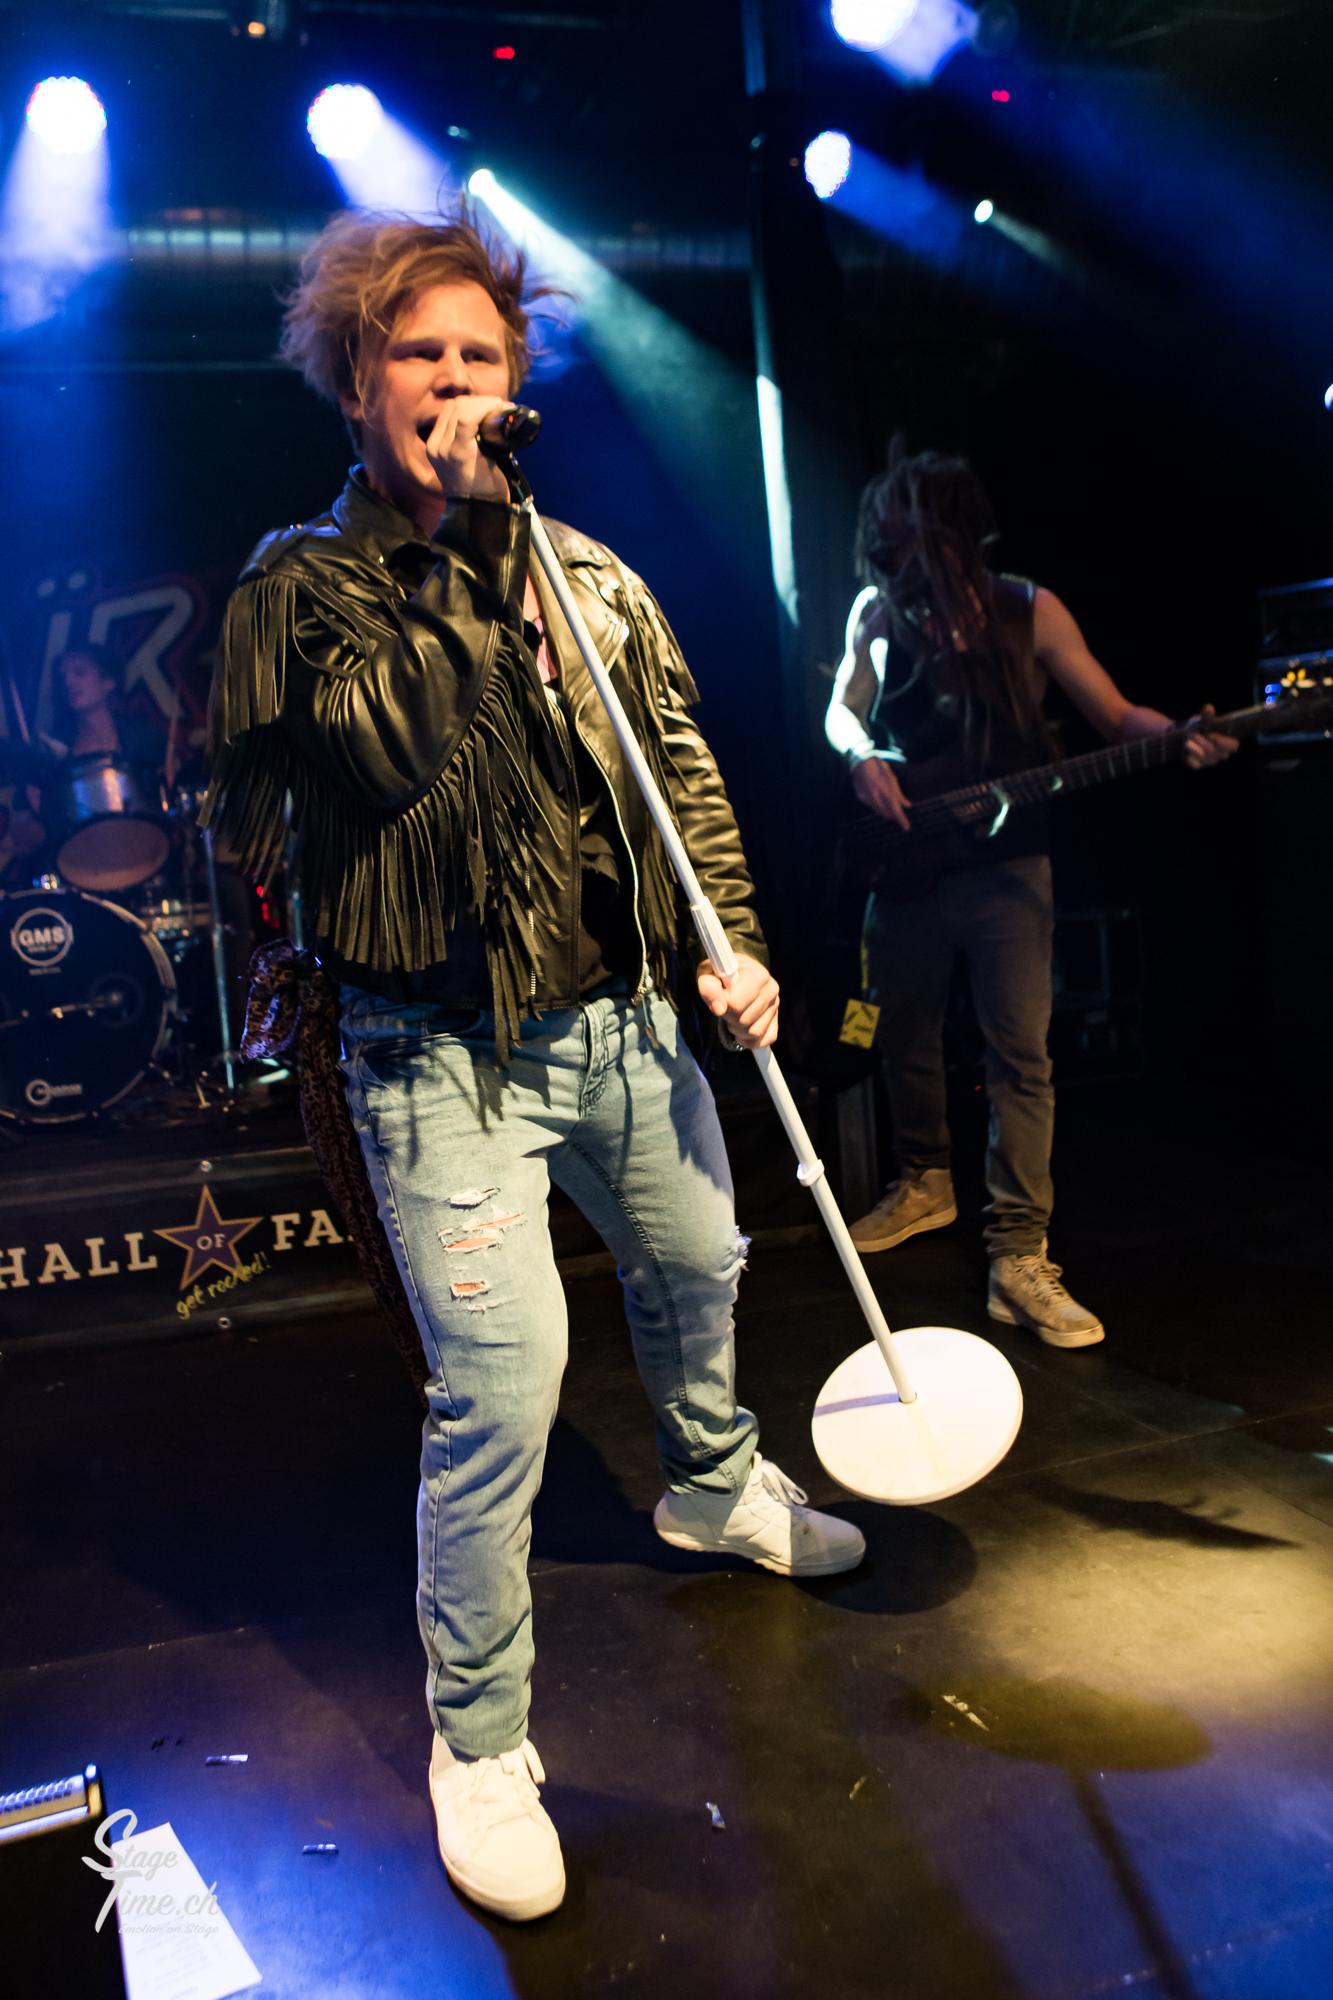 Hairdryer___1st_Swiss_Glam_Rock_Fest-8